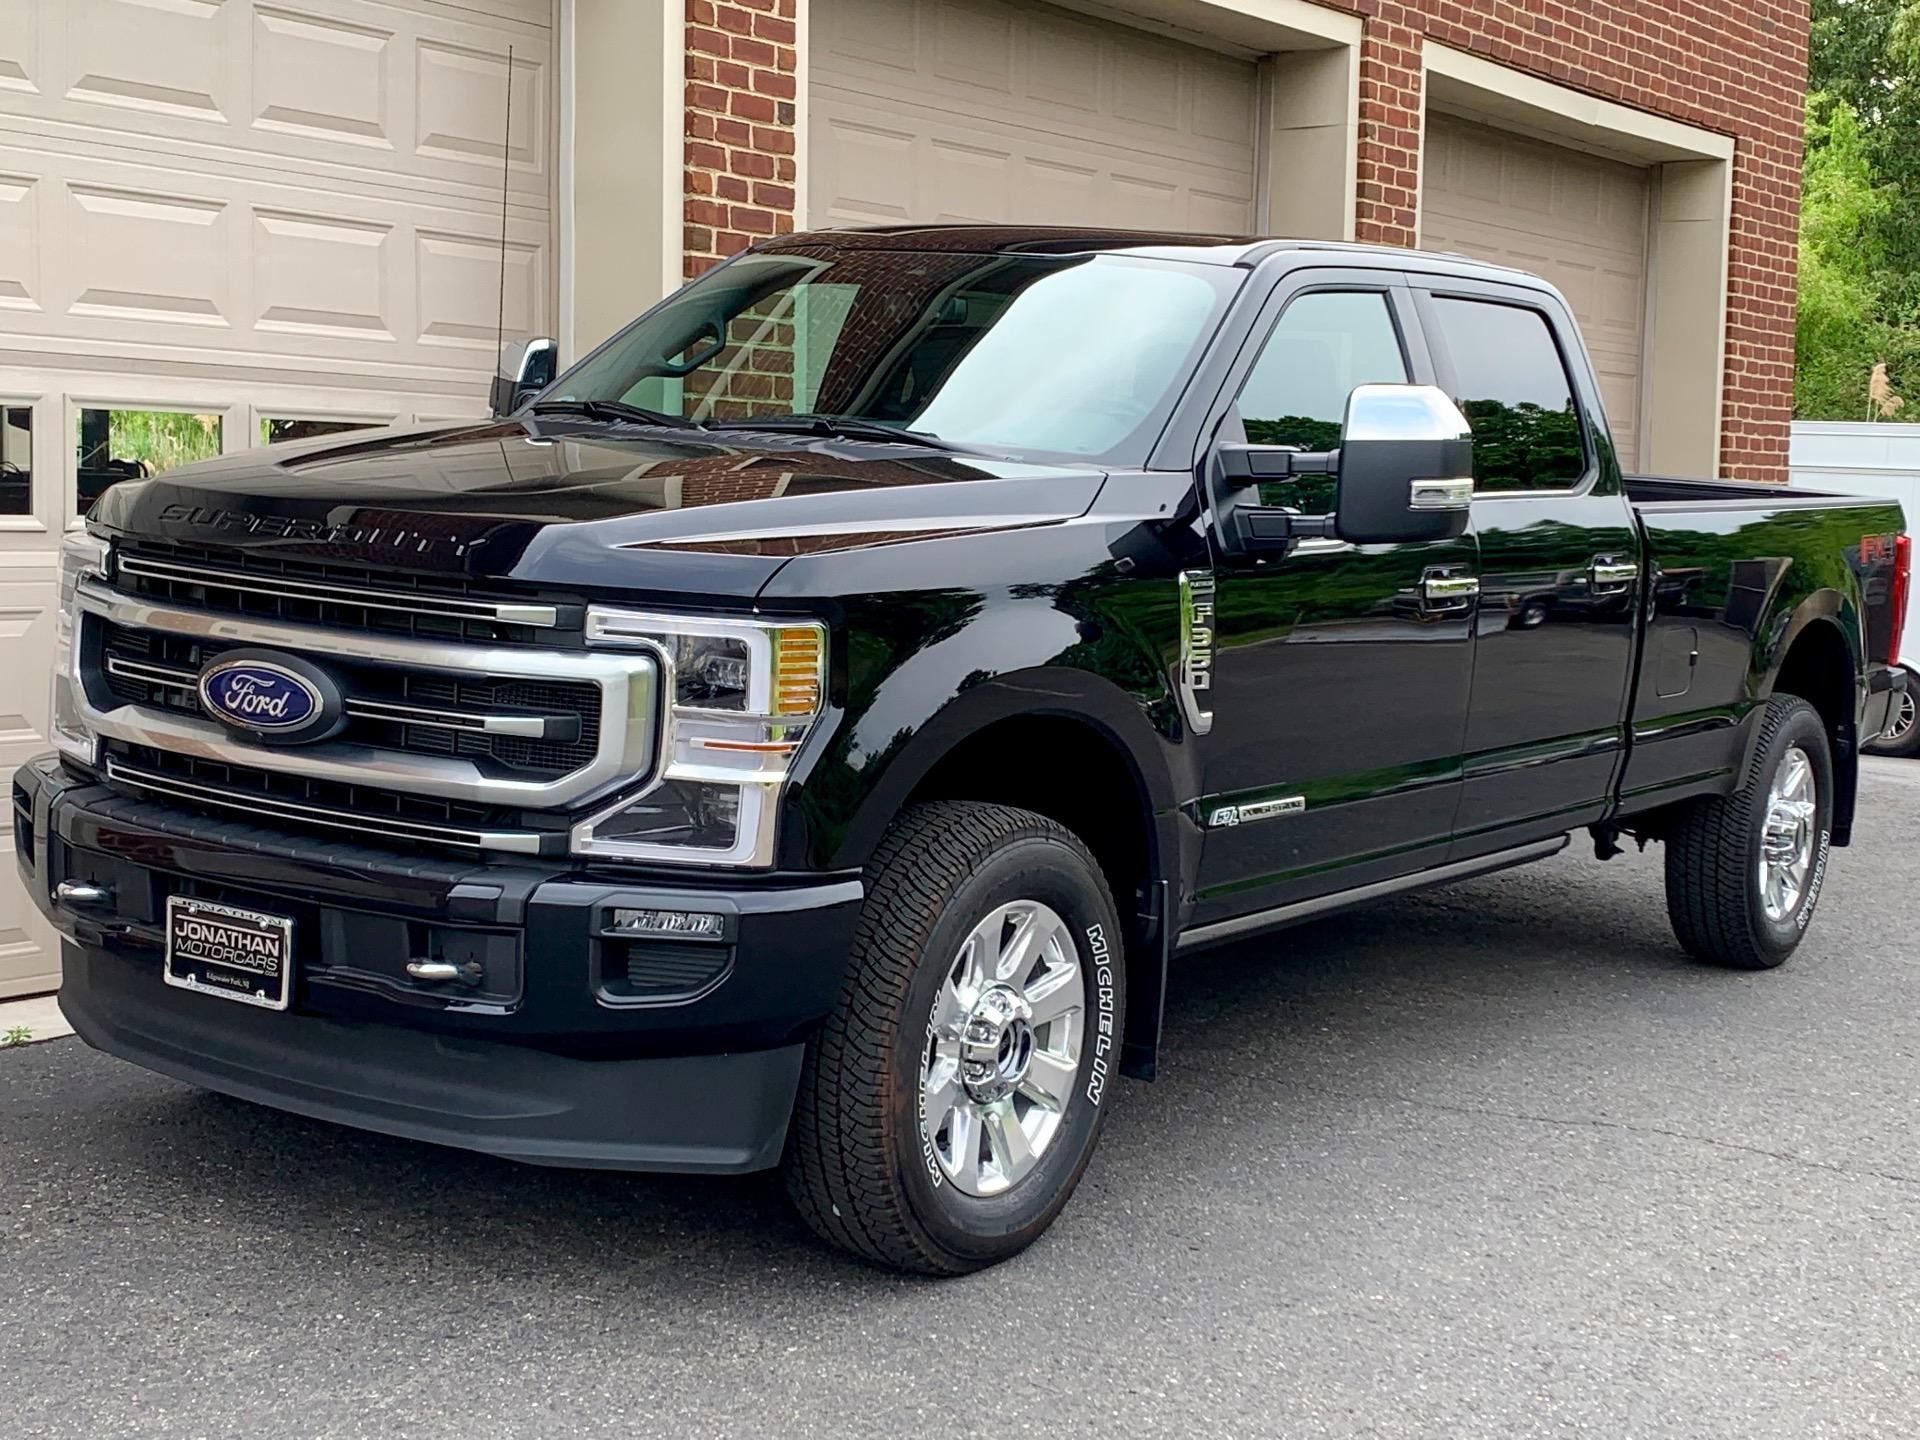 Used-2021-Ford-F-350-Super-Duty-Platinum